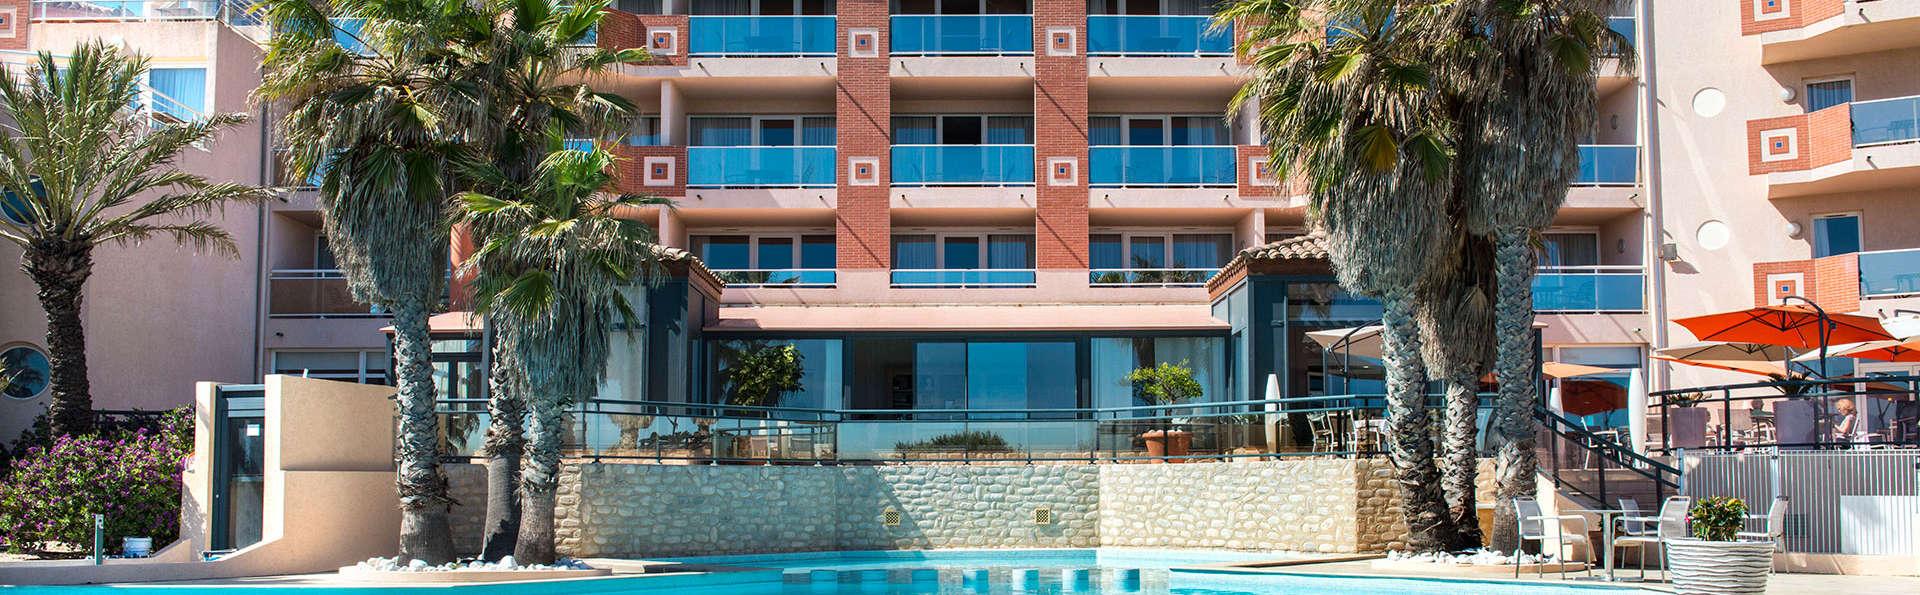 Grand Hôtel Les Flamants Roses - edit_pool42.jpg